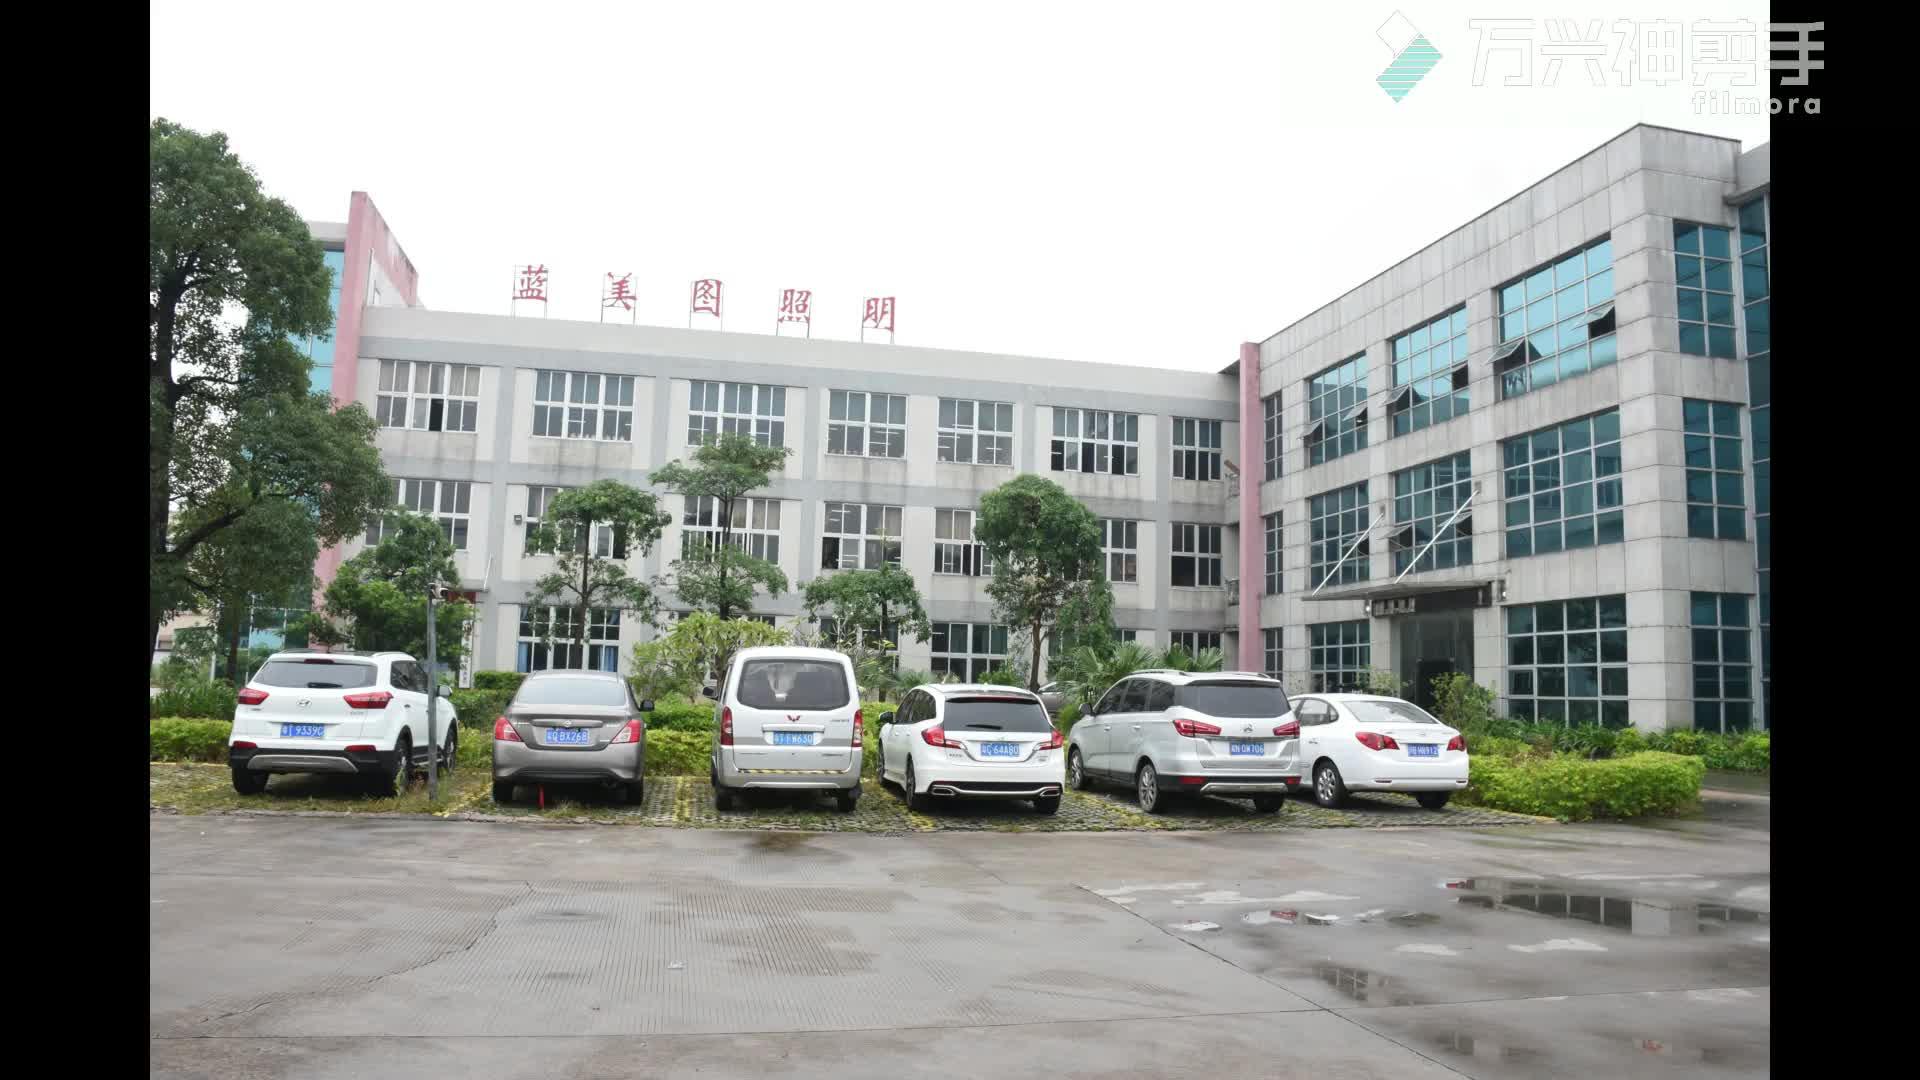 Pabrik Harga Solar Semua Dalam Satu Lampu Jalan LED 20 W 40 W 60 W Solar Lampu Jalan Surya lampu Taman